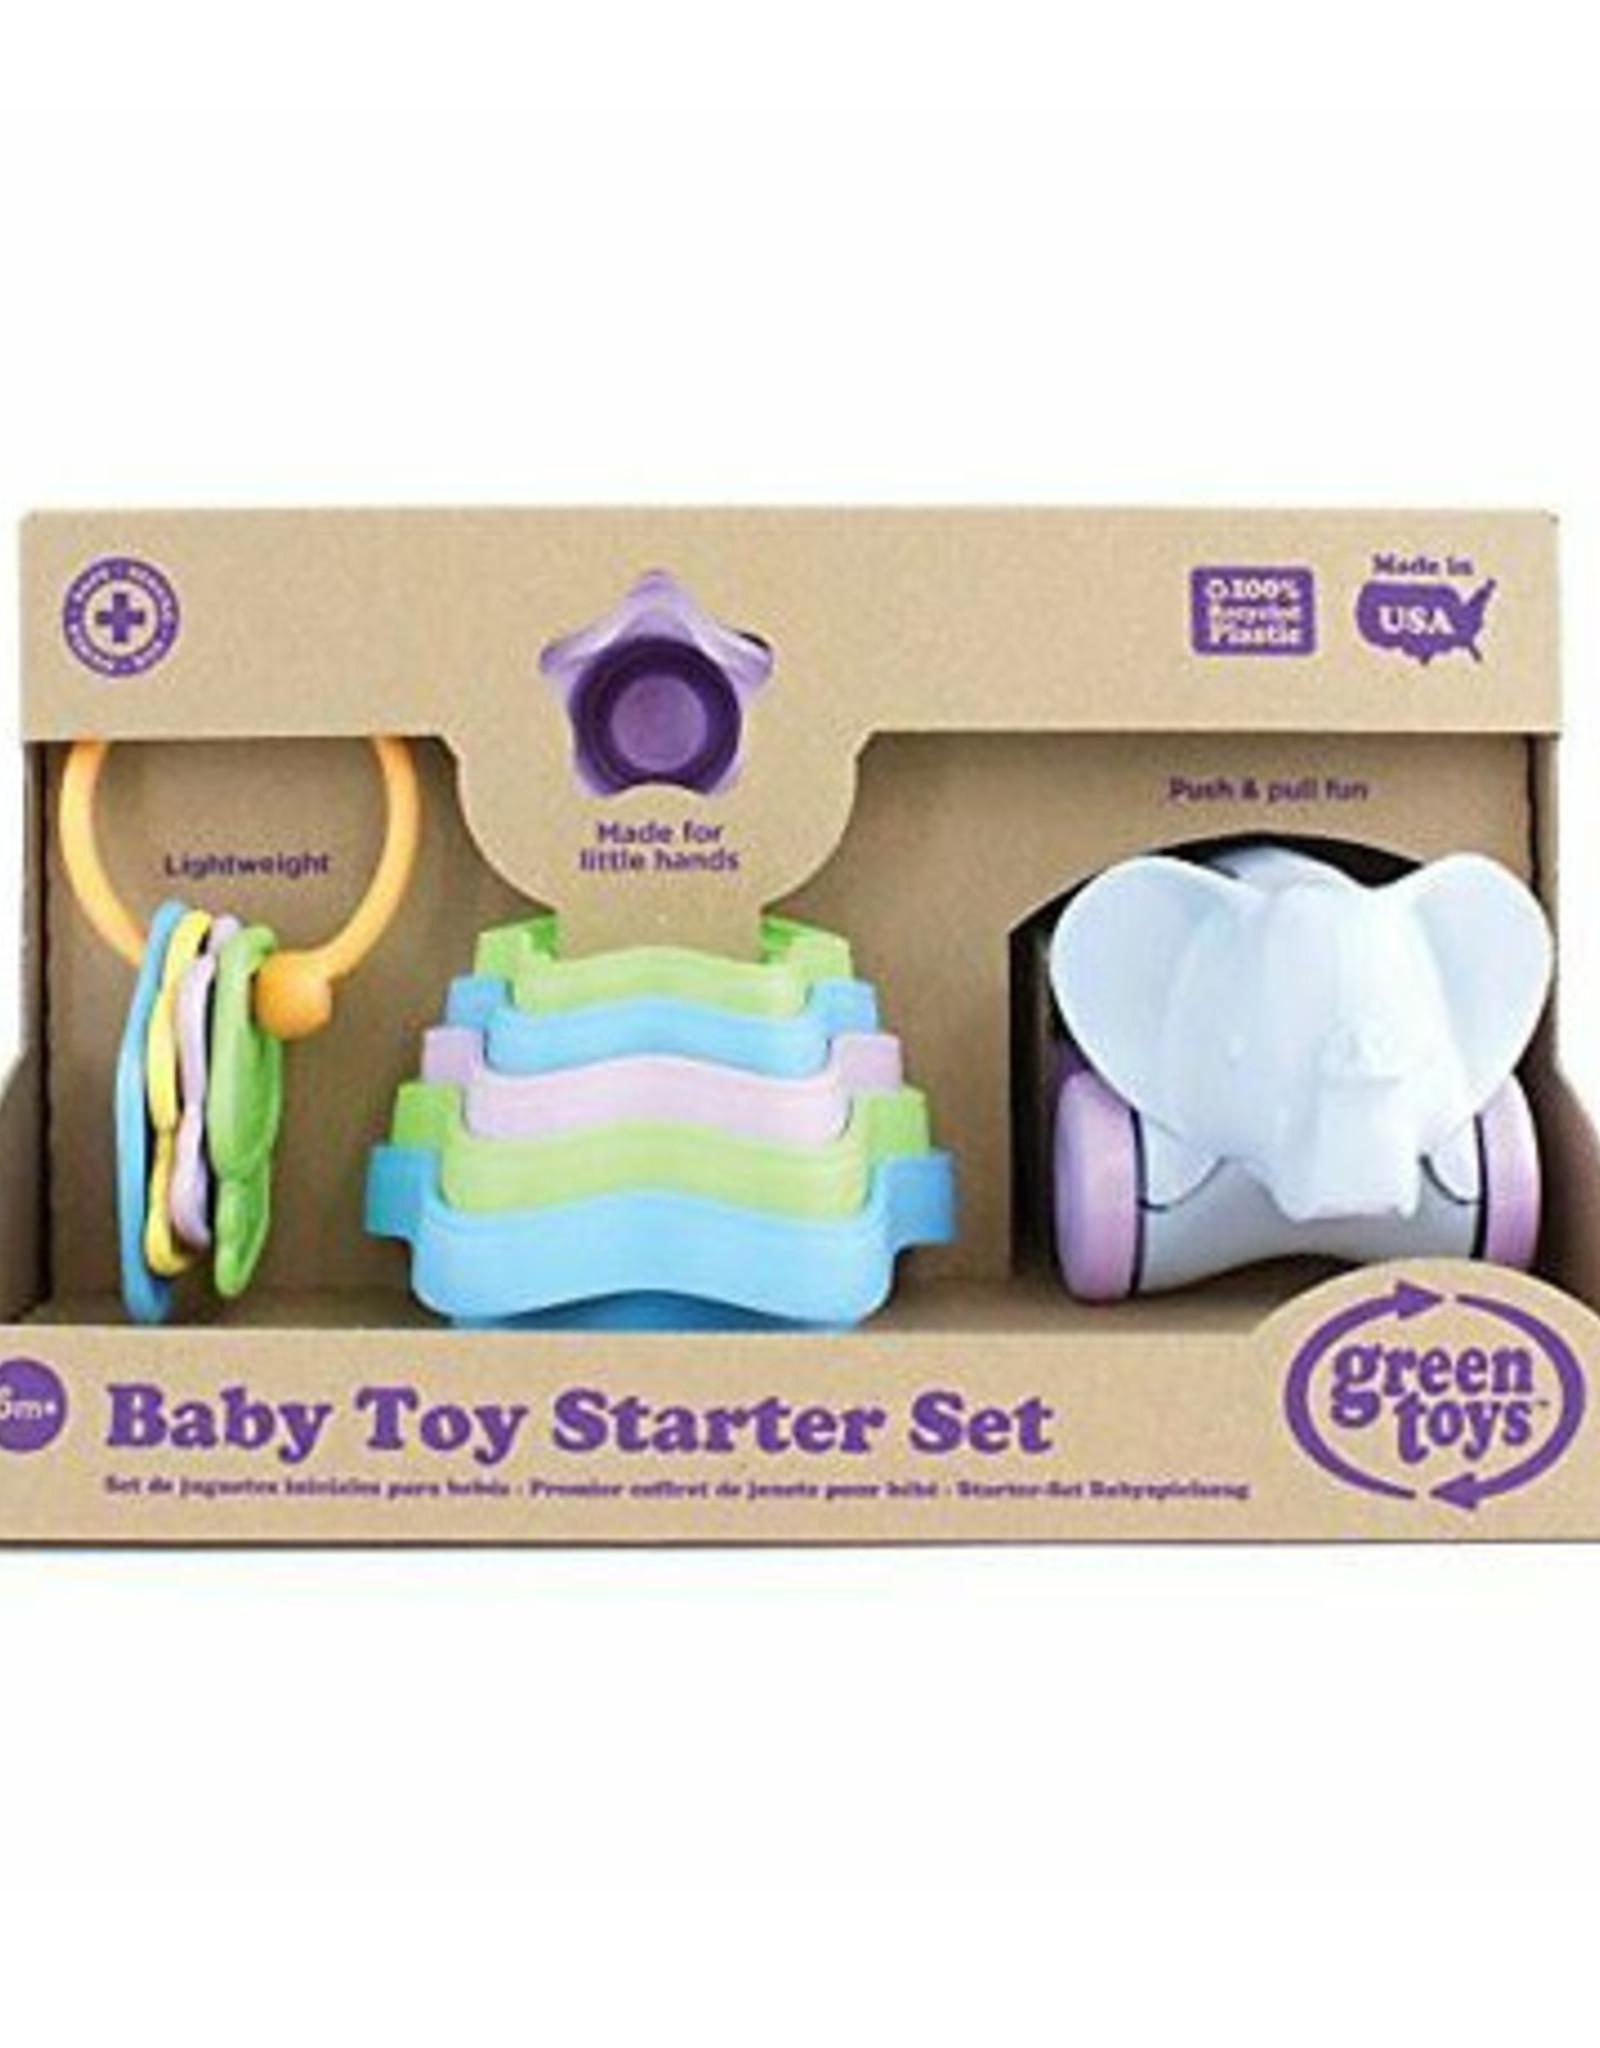 Green Toys Baby Toy Starter Set green toys